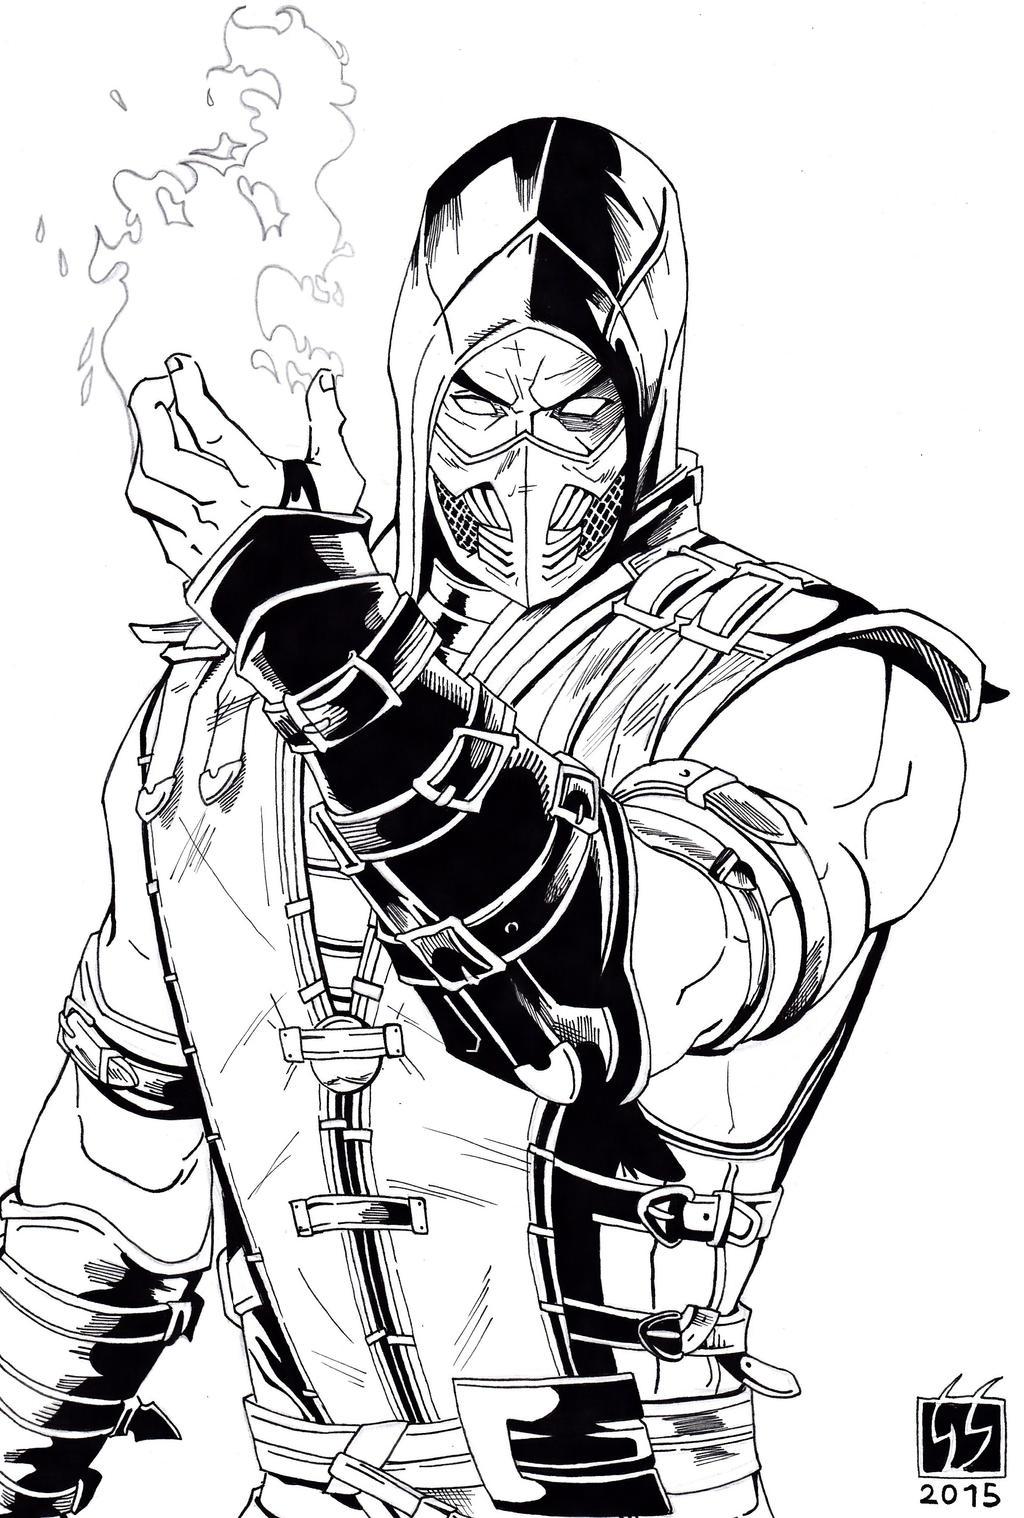 Scorpion Mortal Kombat X Black And White By Gabred Hat